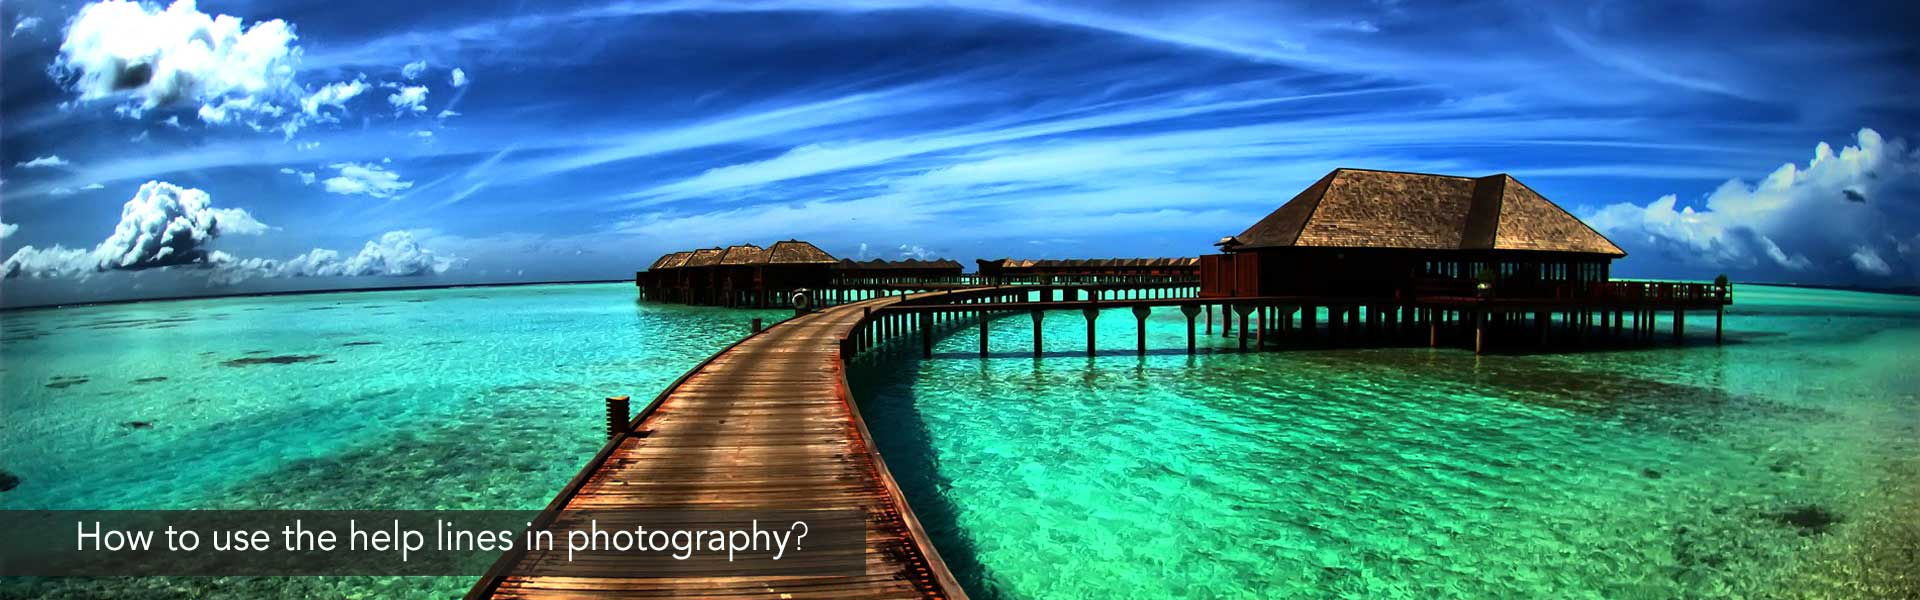 Leading Lines  Photography 4 2 - خطوط راهنما در عکاسی